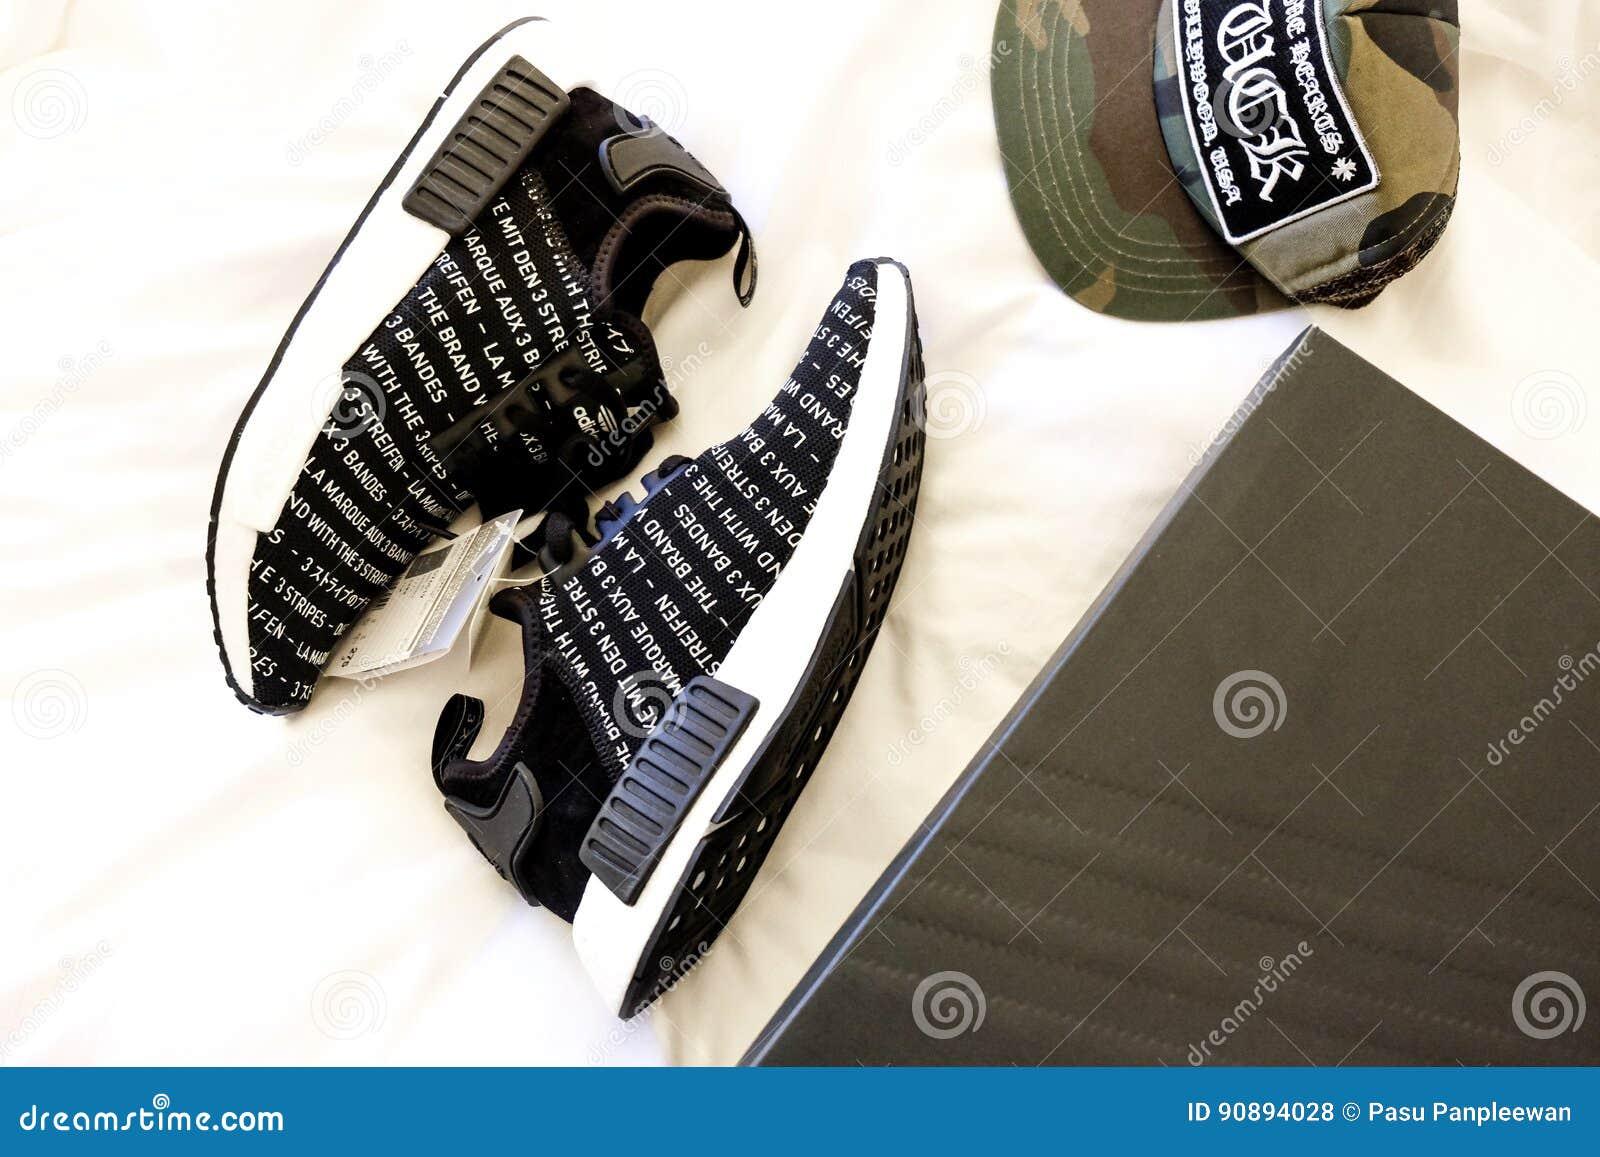 Ressort A Adidas Adidas Chaussure A Adidas Chaussure Ressort Adidas Chaussure Chaussure A Ressort A 4S5c3RjLqA